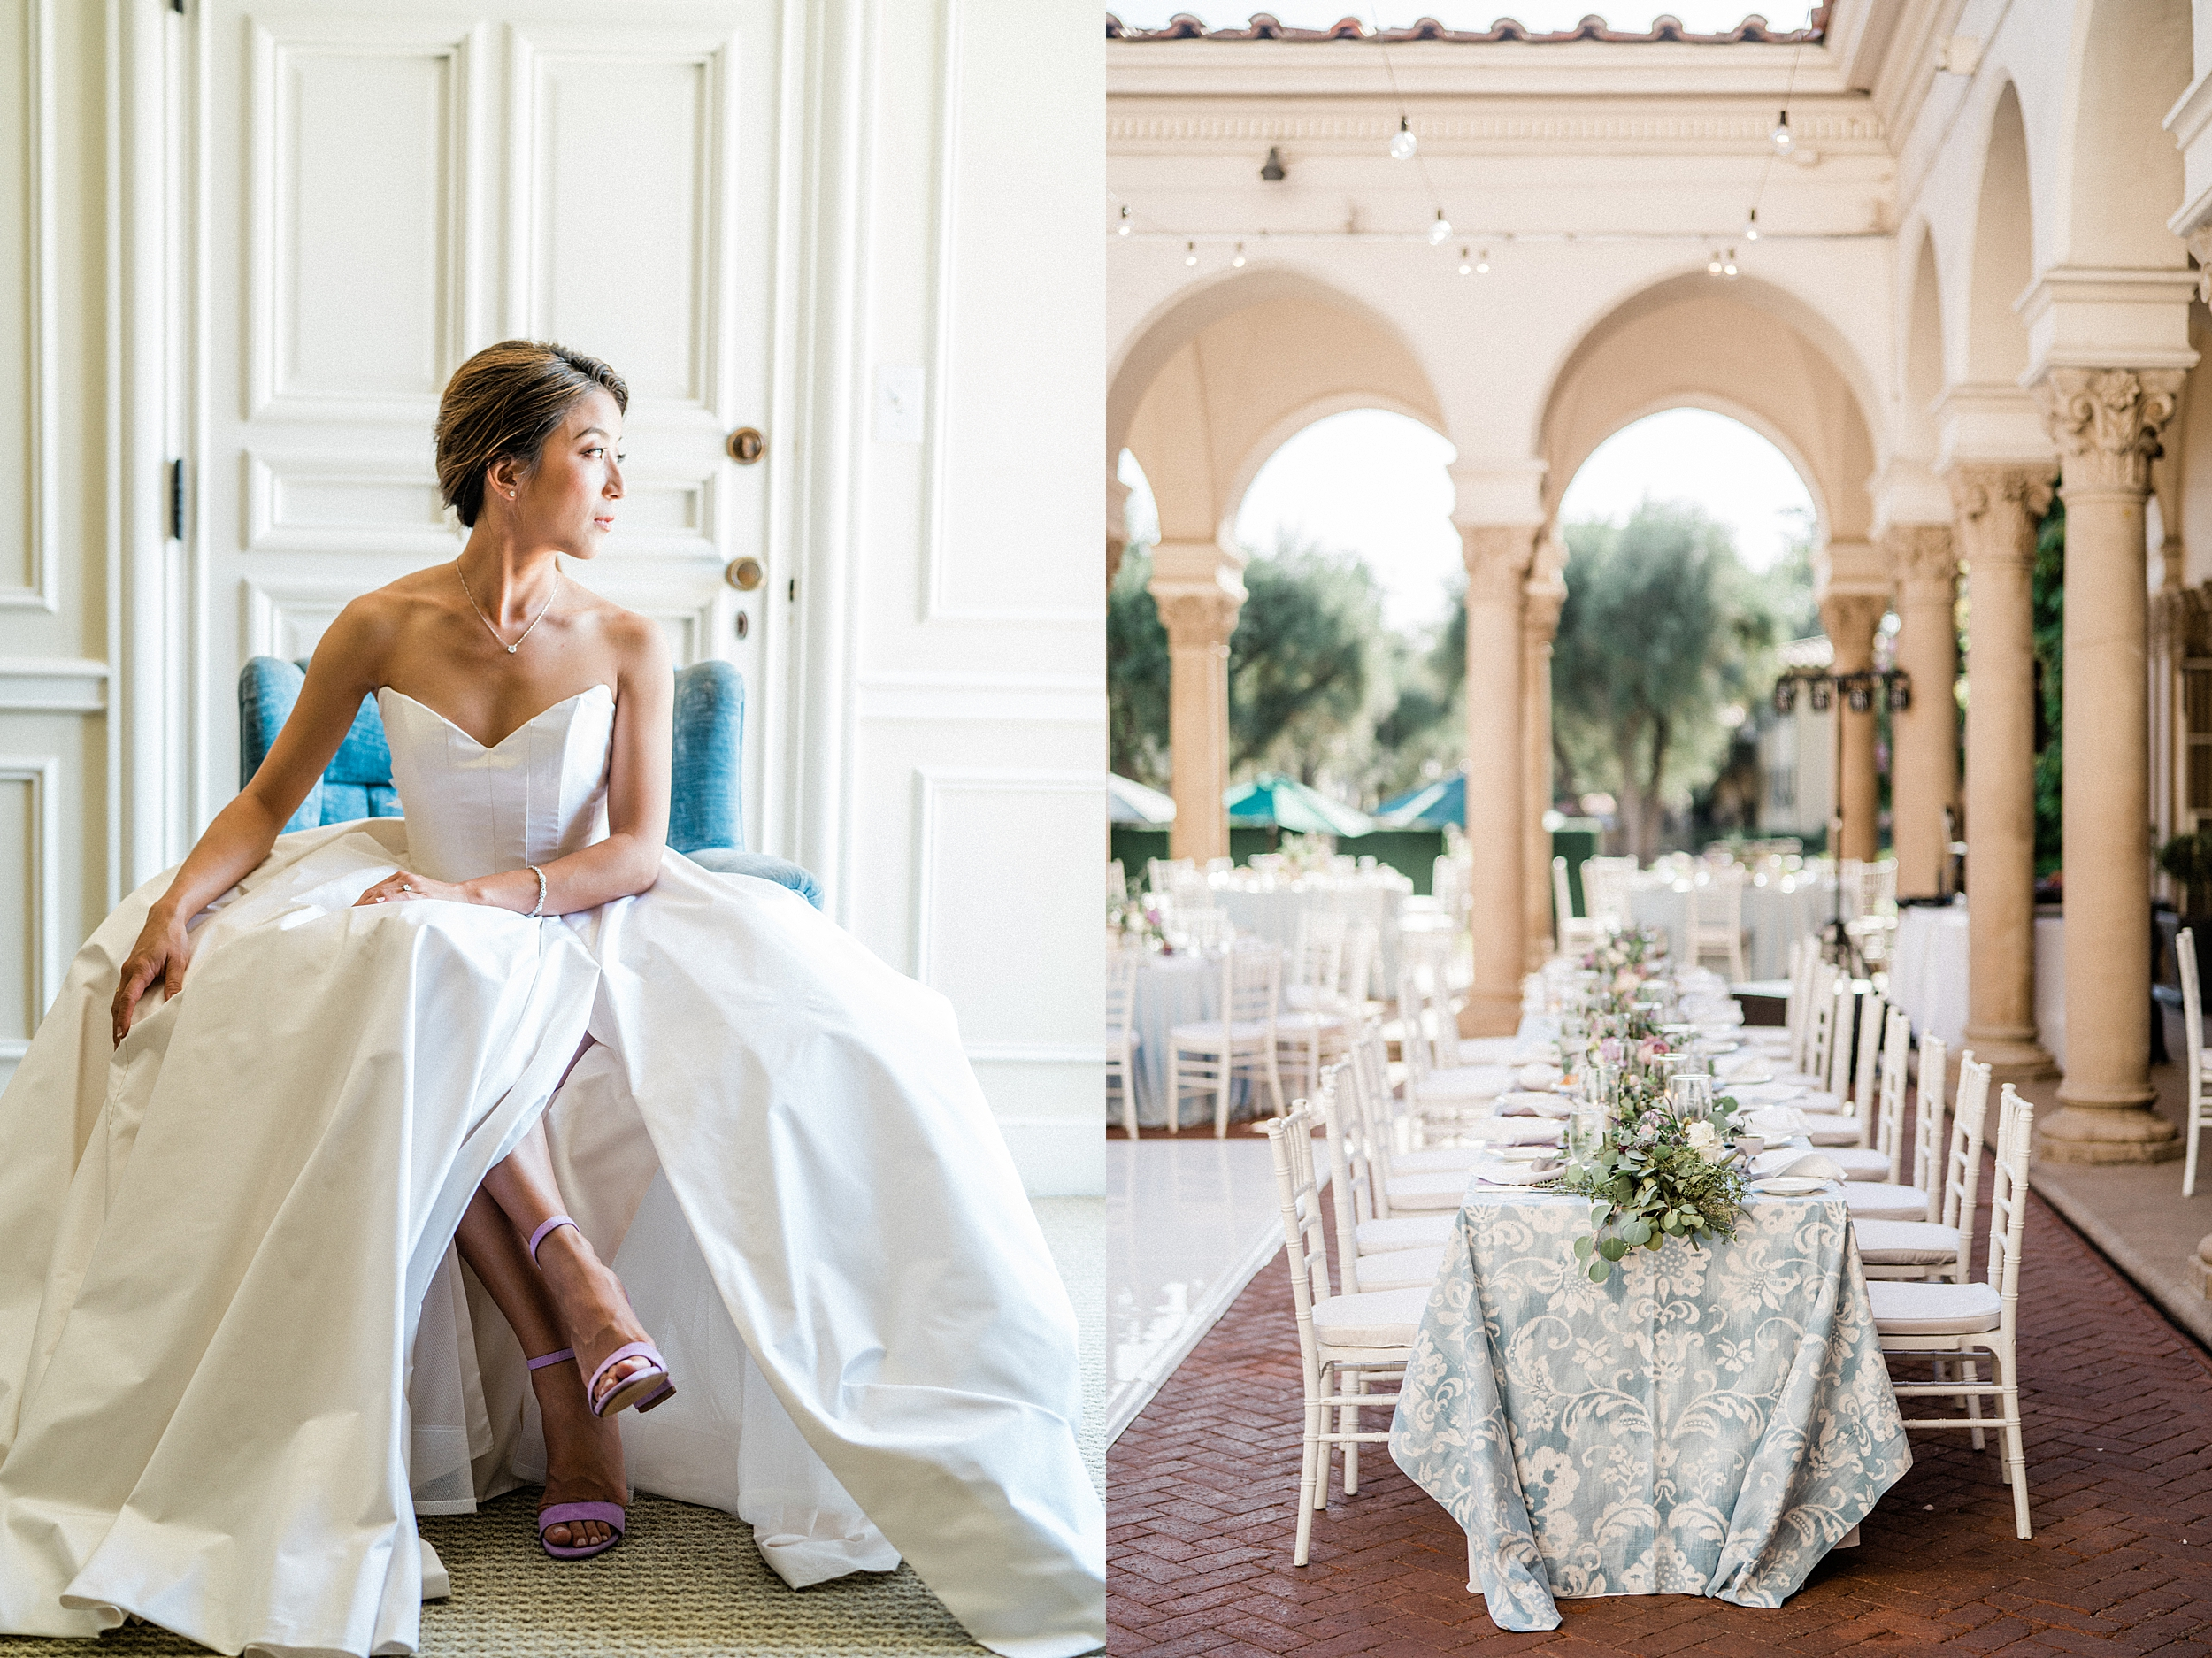 Caltech Wedding Stewart and Connie Photography_0007.jpg